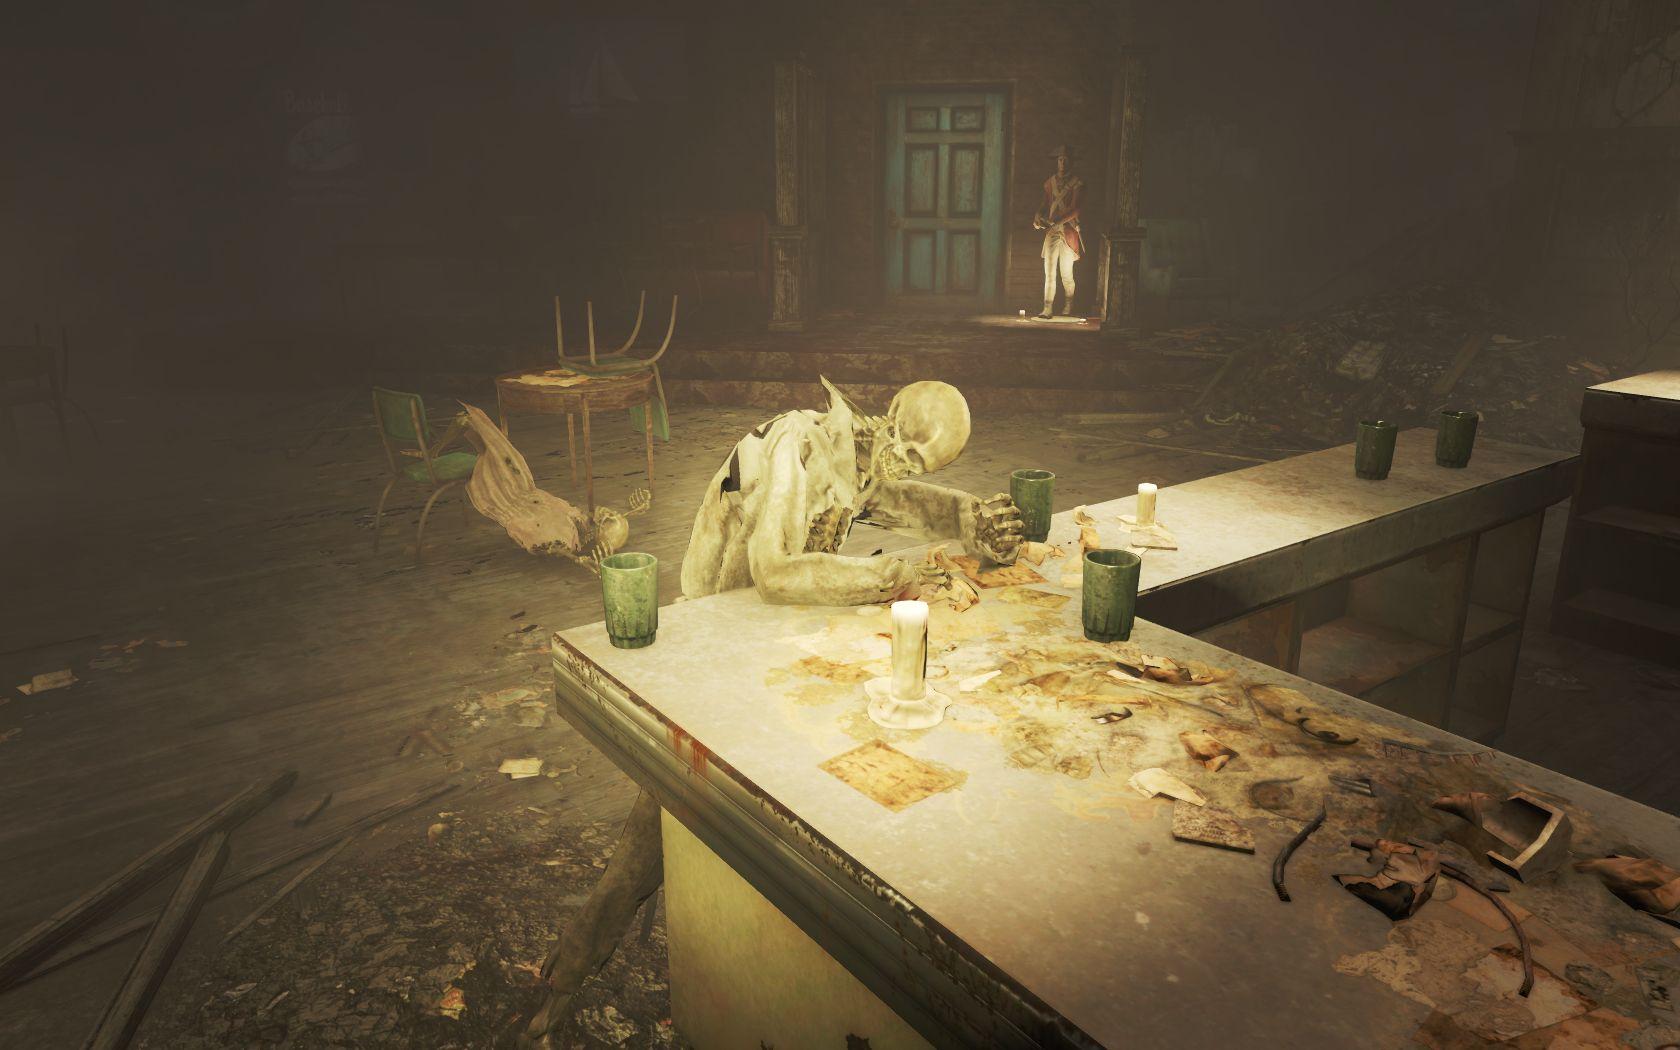 Бар 'За ваше здоровье!' 3 - Fallout 4 Скелет, Юмор